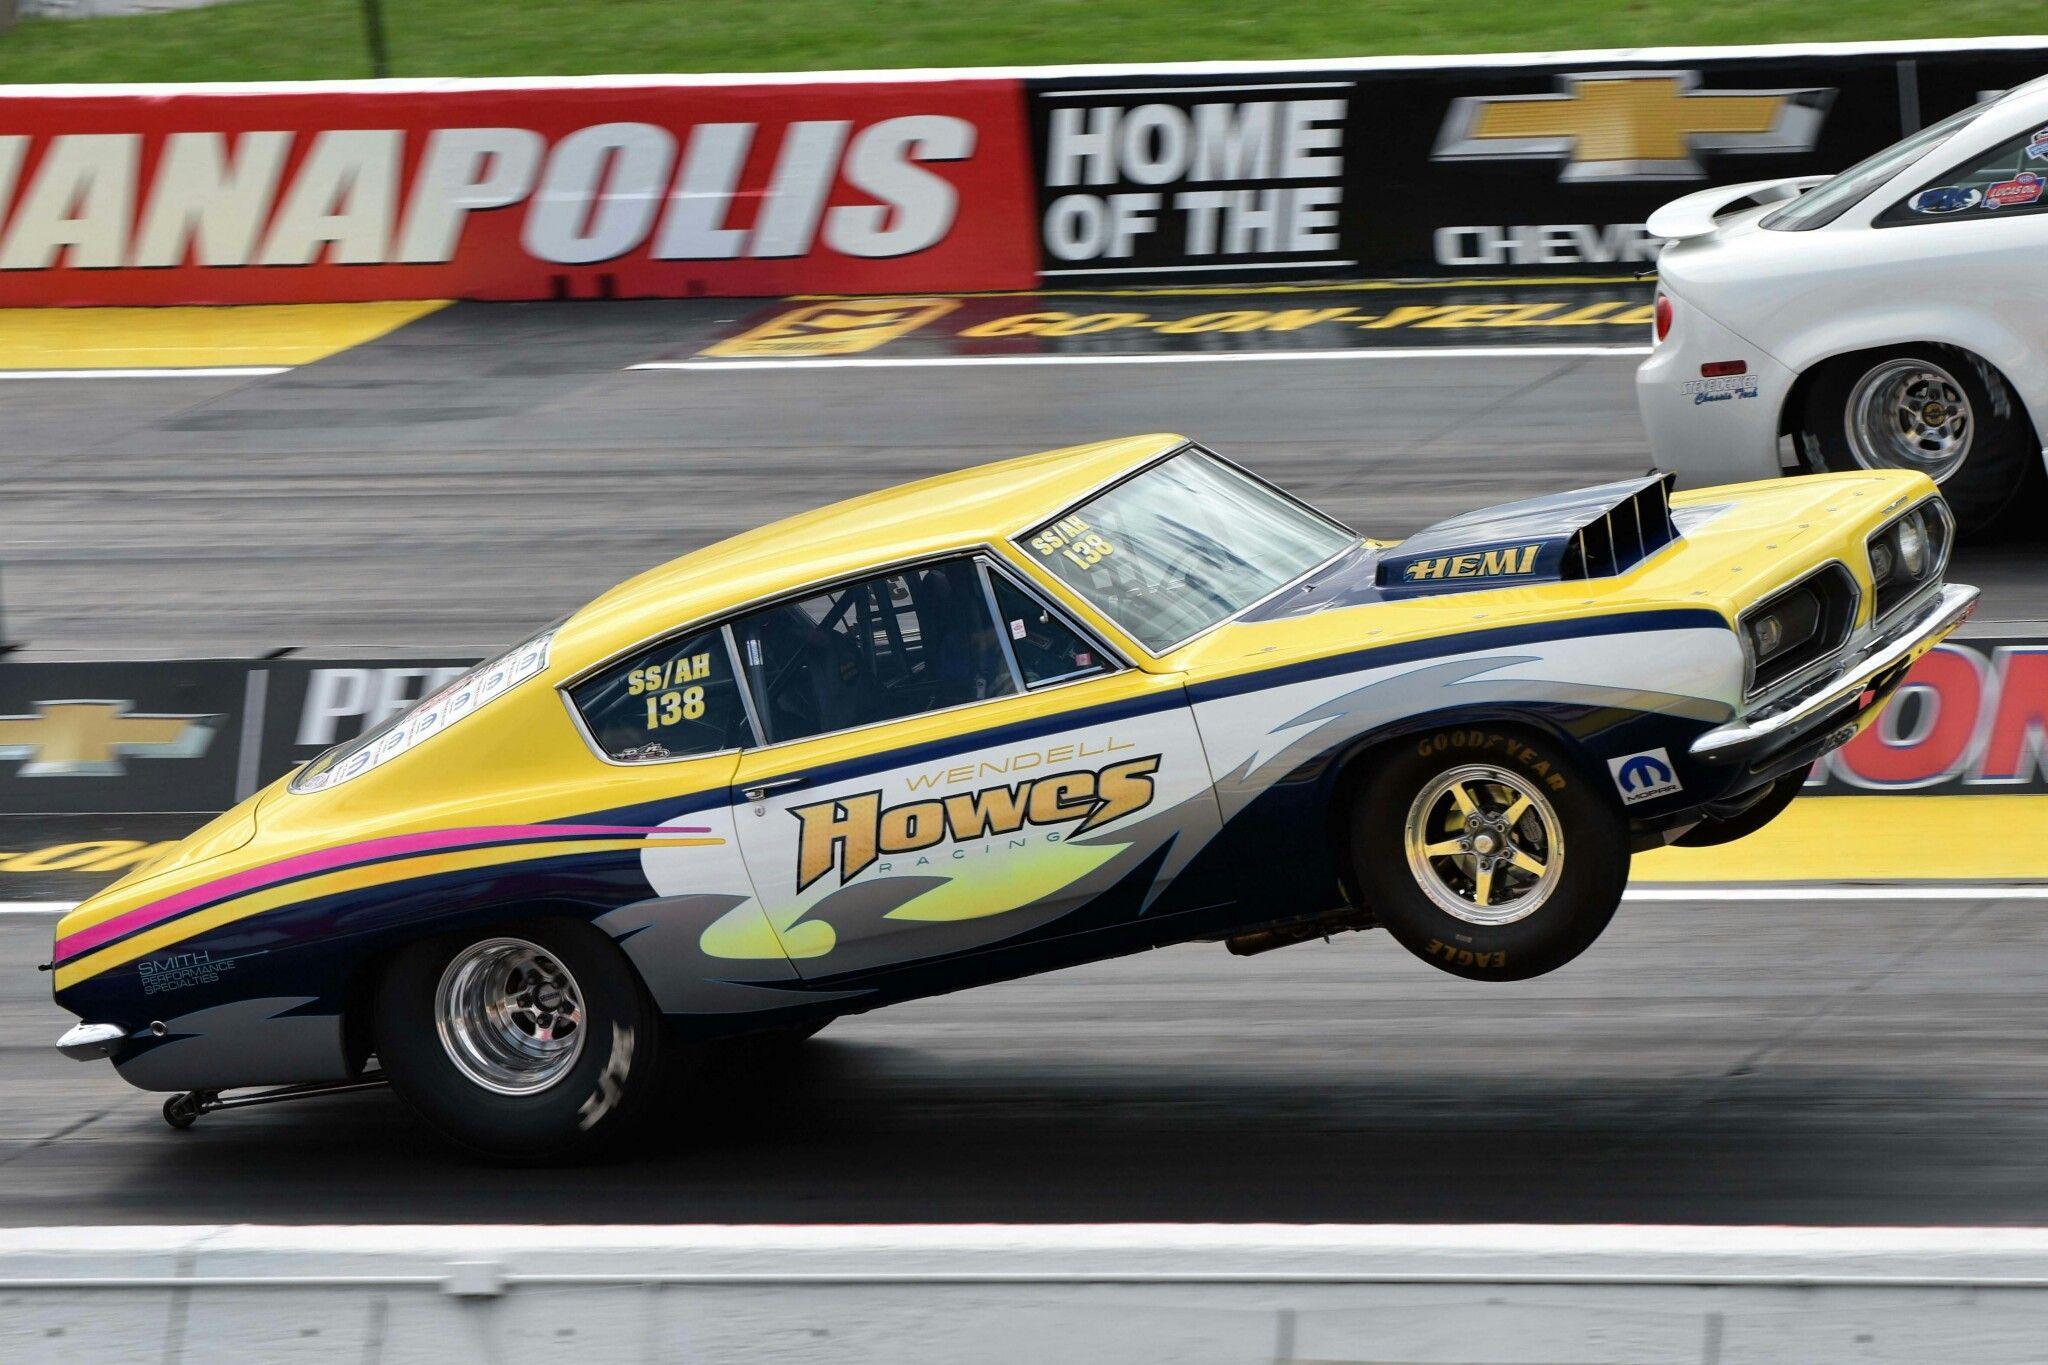 Pin by Andrew B. on Race Cars &Classics | Pinterest | Mopar, Drag ...